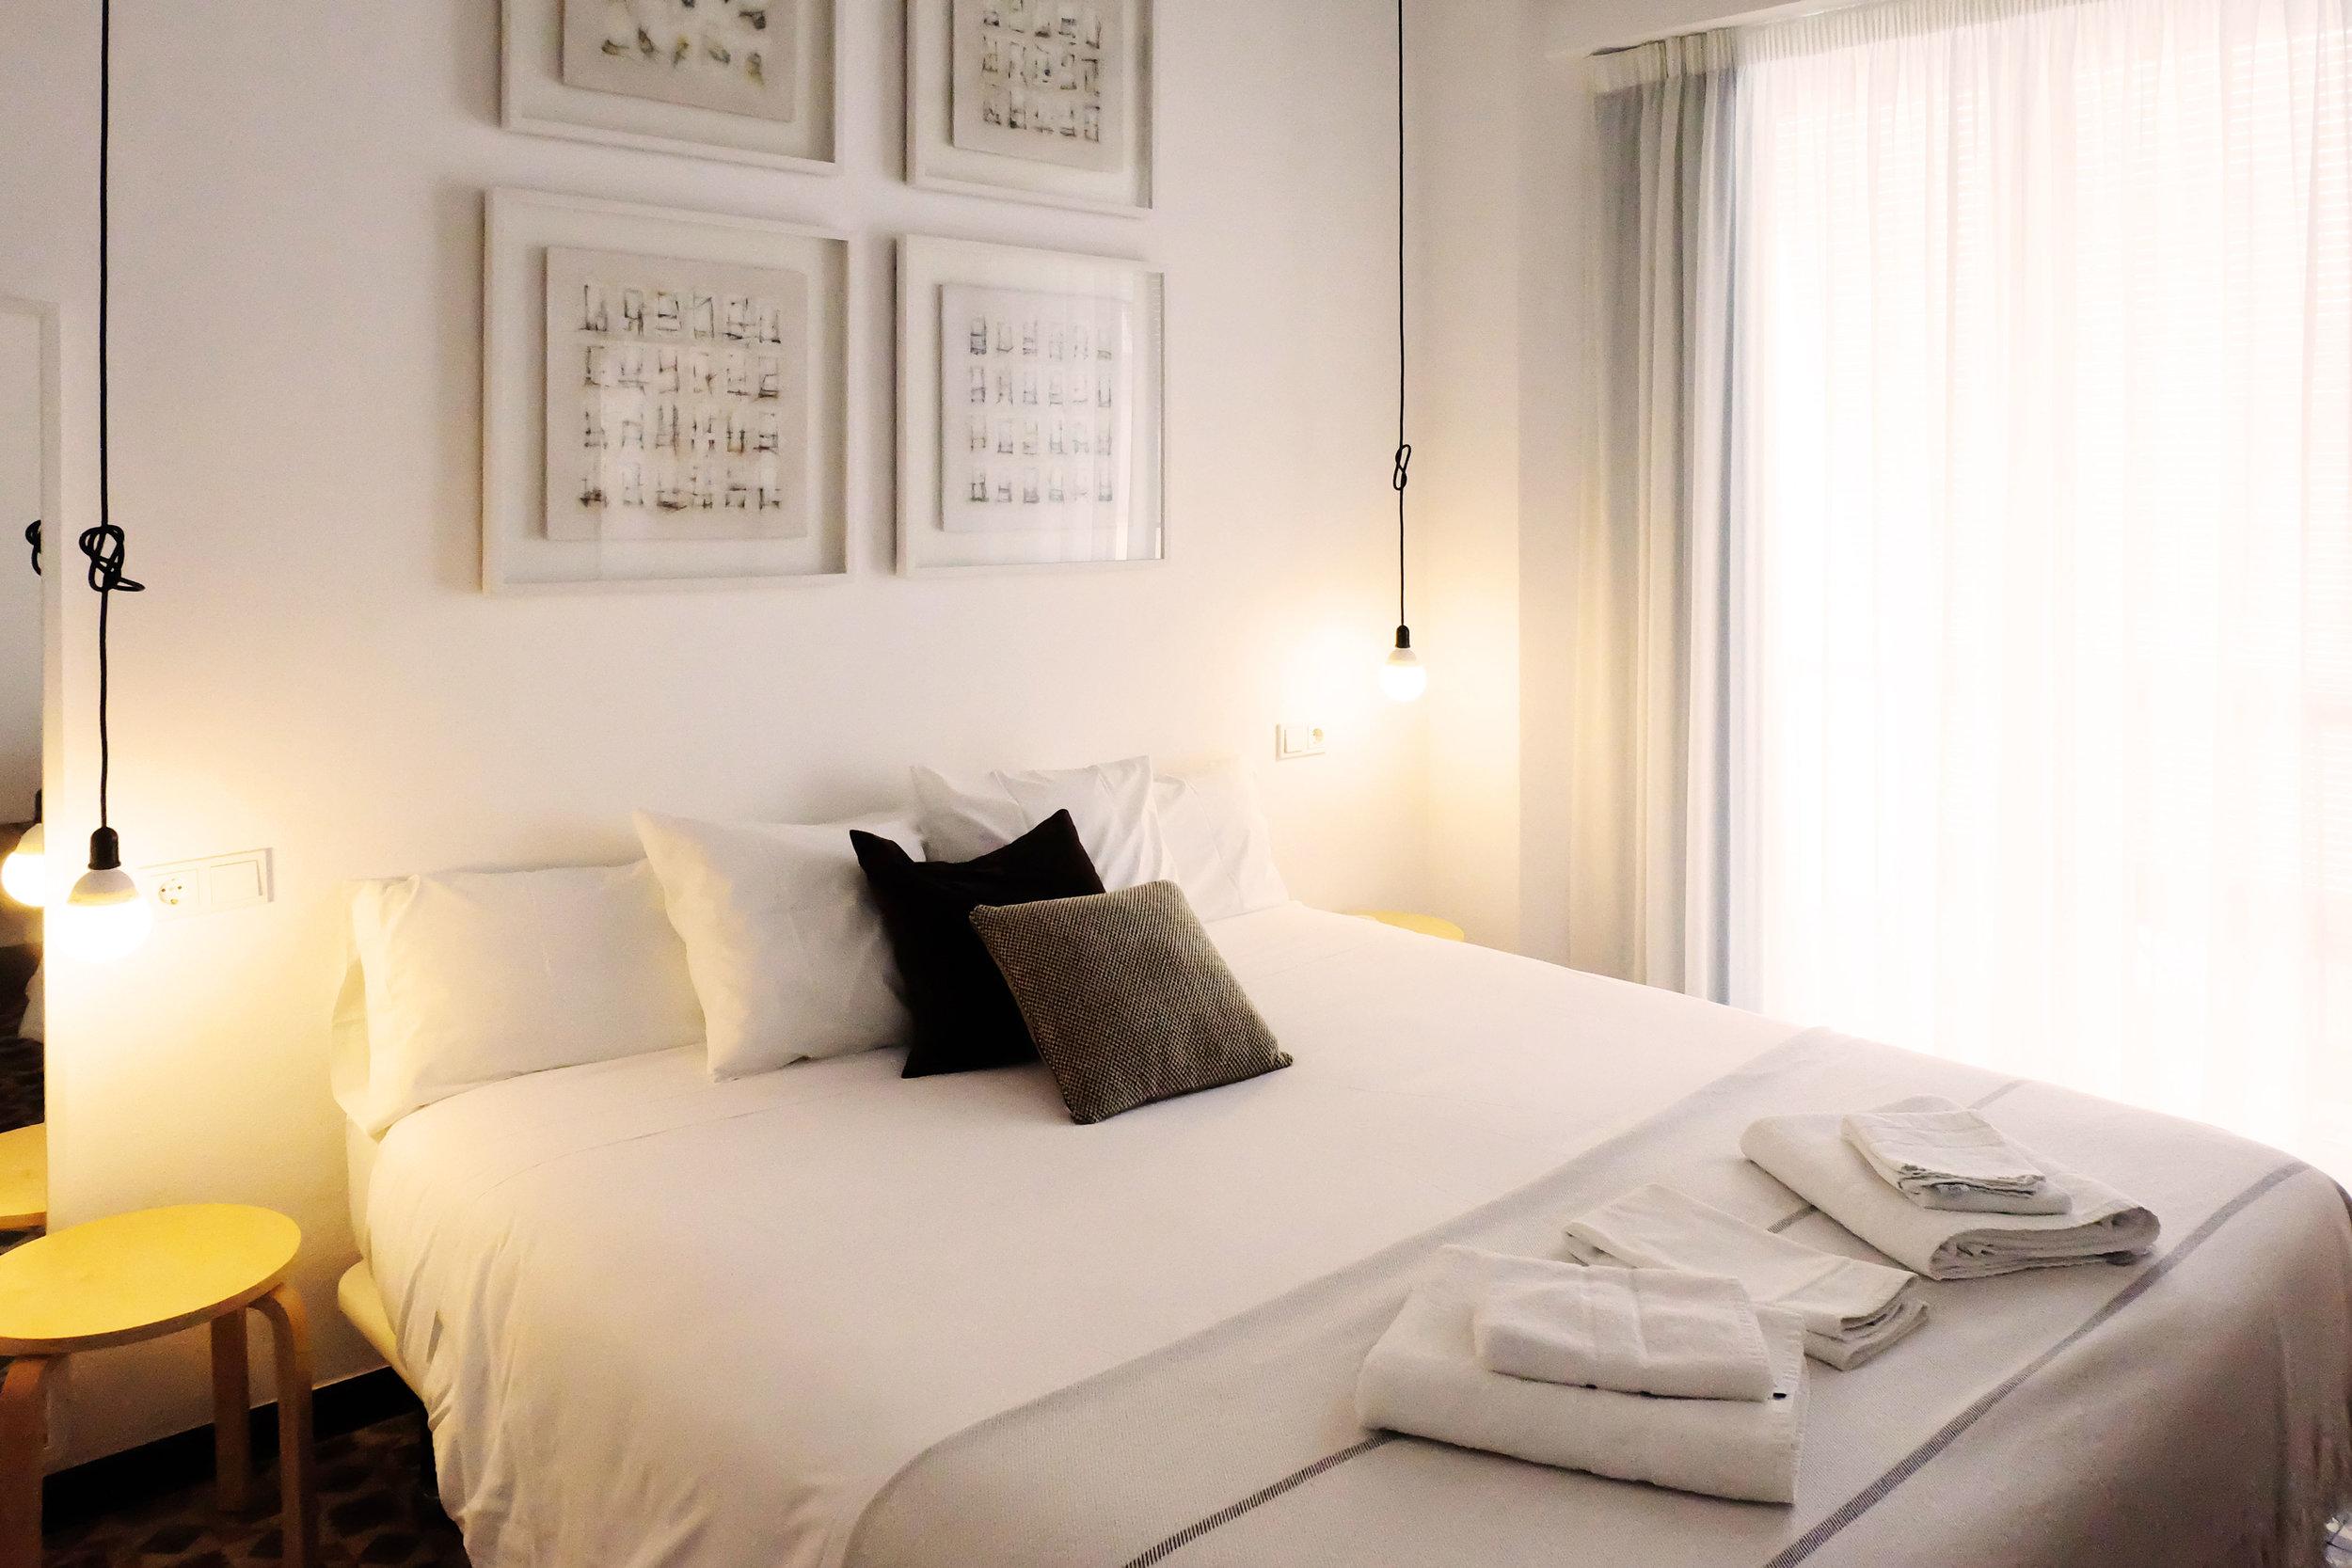 Hotel-Casa-de-huespedes-santa-maria-Habitacion-8-11.JPG